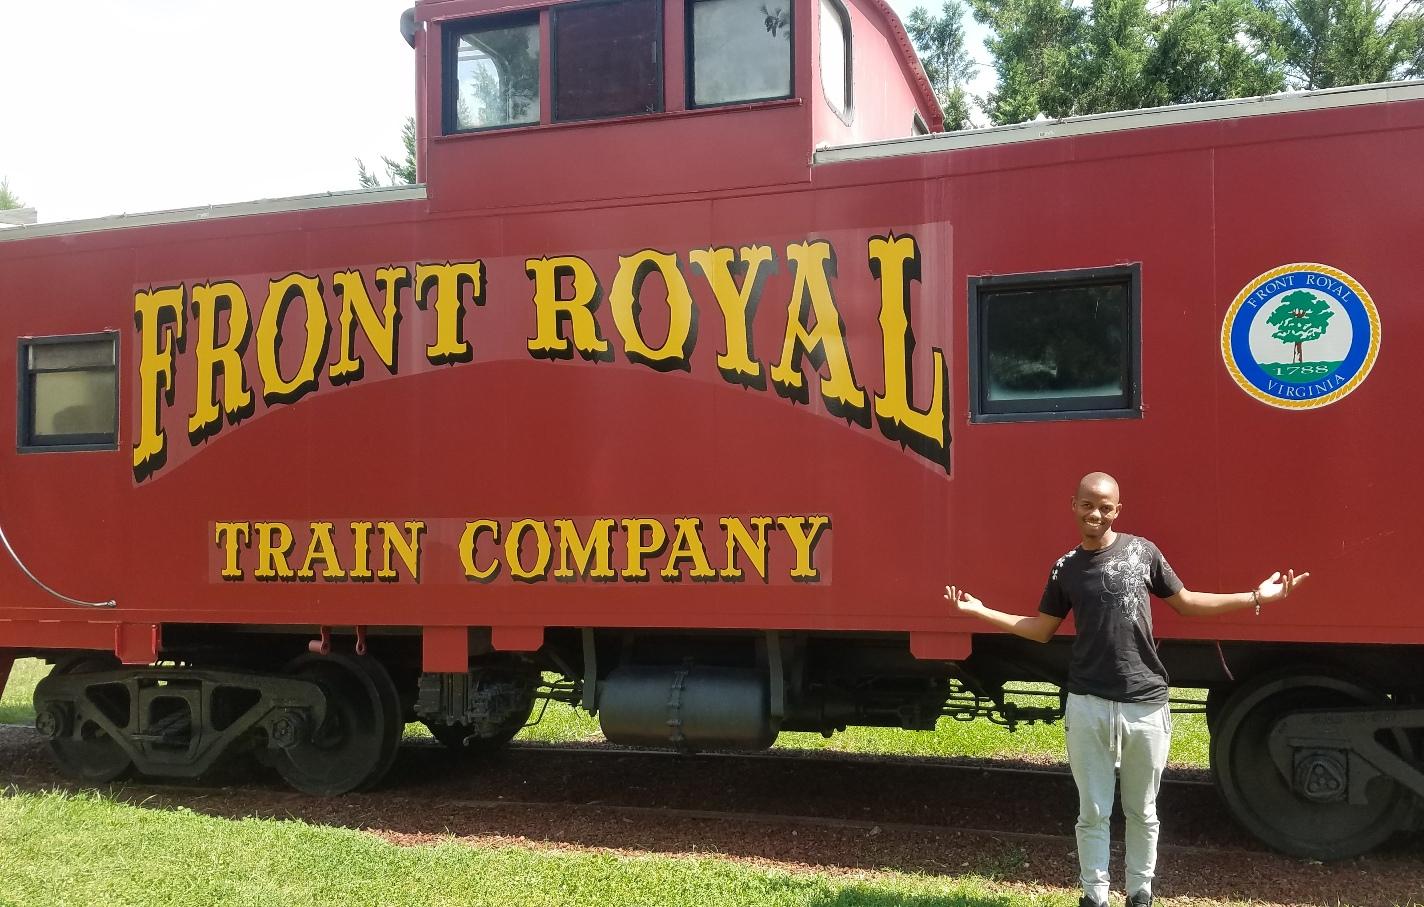 front royal train